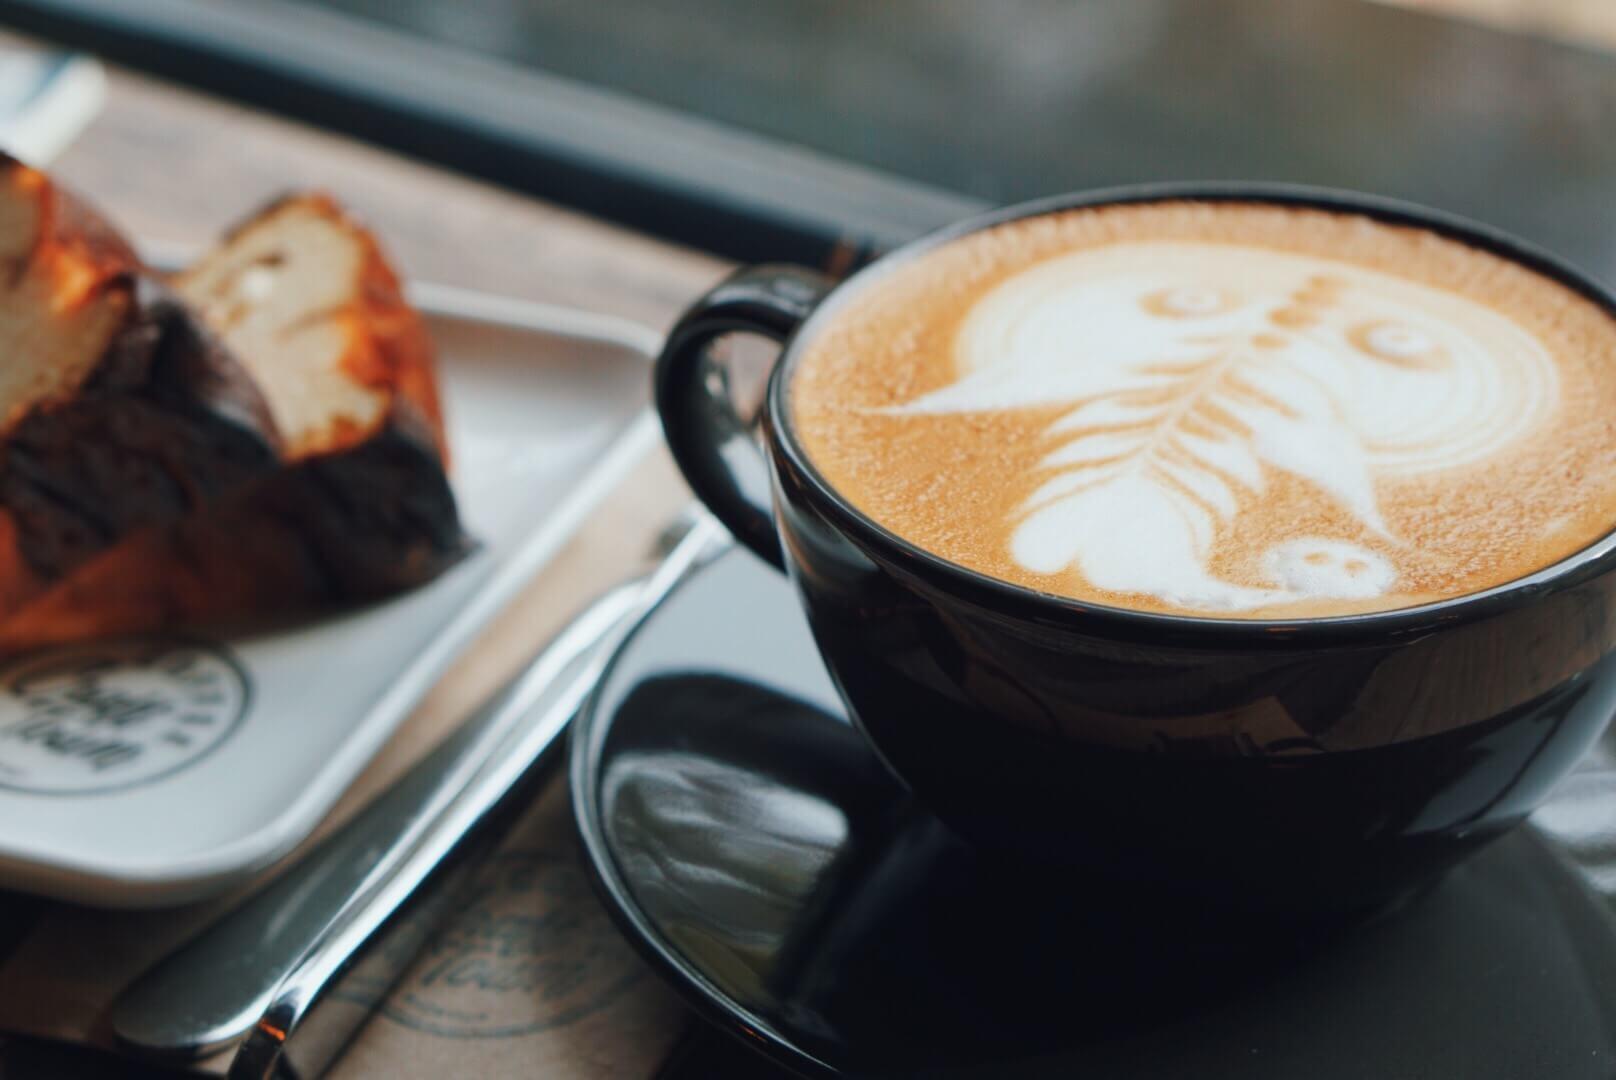 ankara yeni nesil kahveciler Craft Town